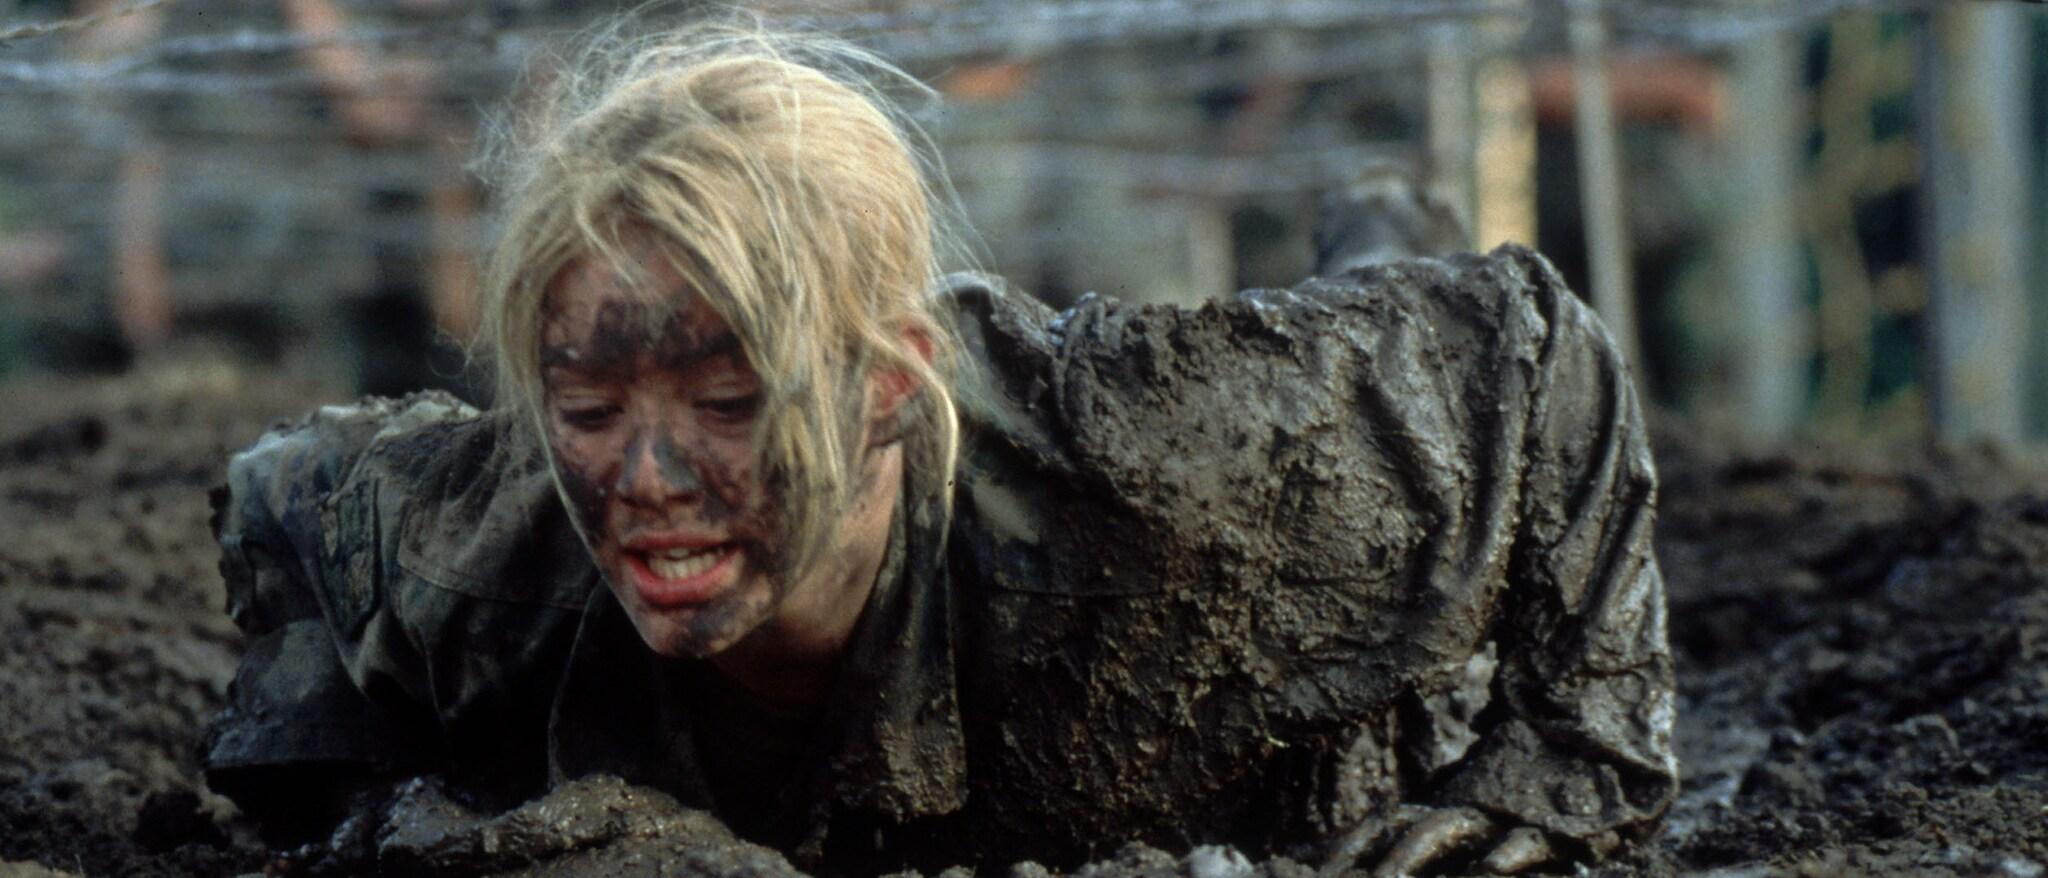 Cadet Kelly Hero